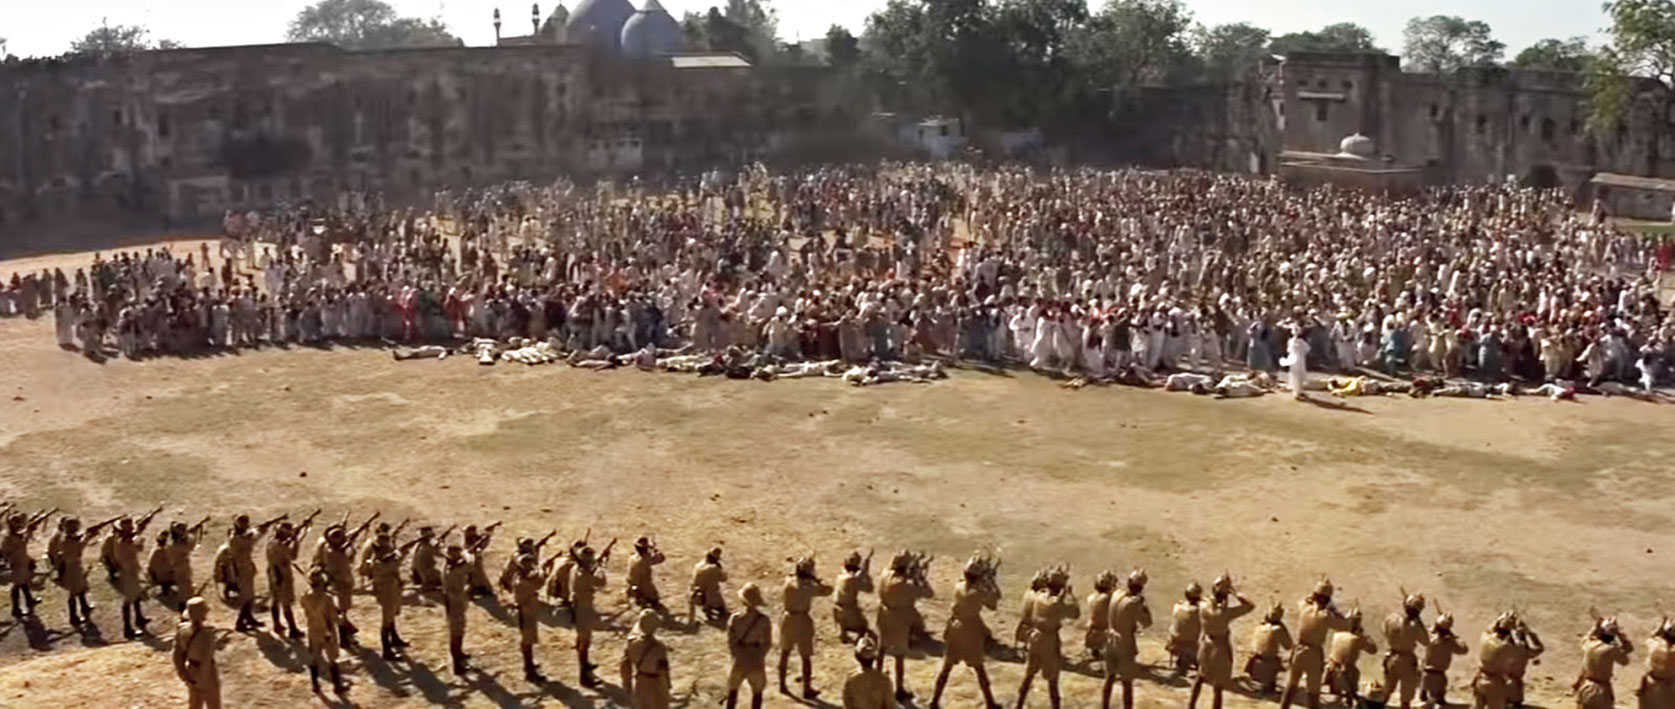 https://www.omilights.com/wp-content/uploads/2020/04/Jallianwala-Bagh-Amritsar